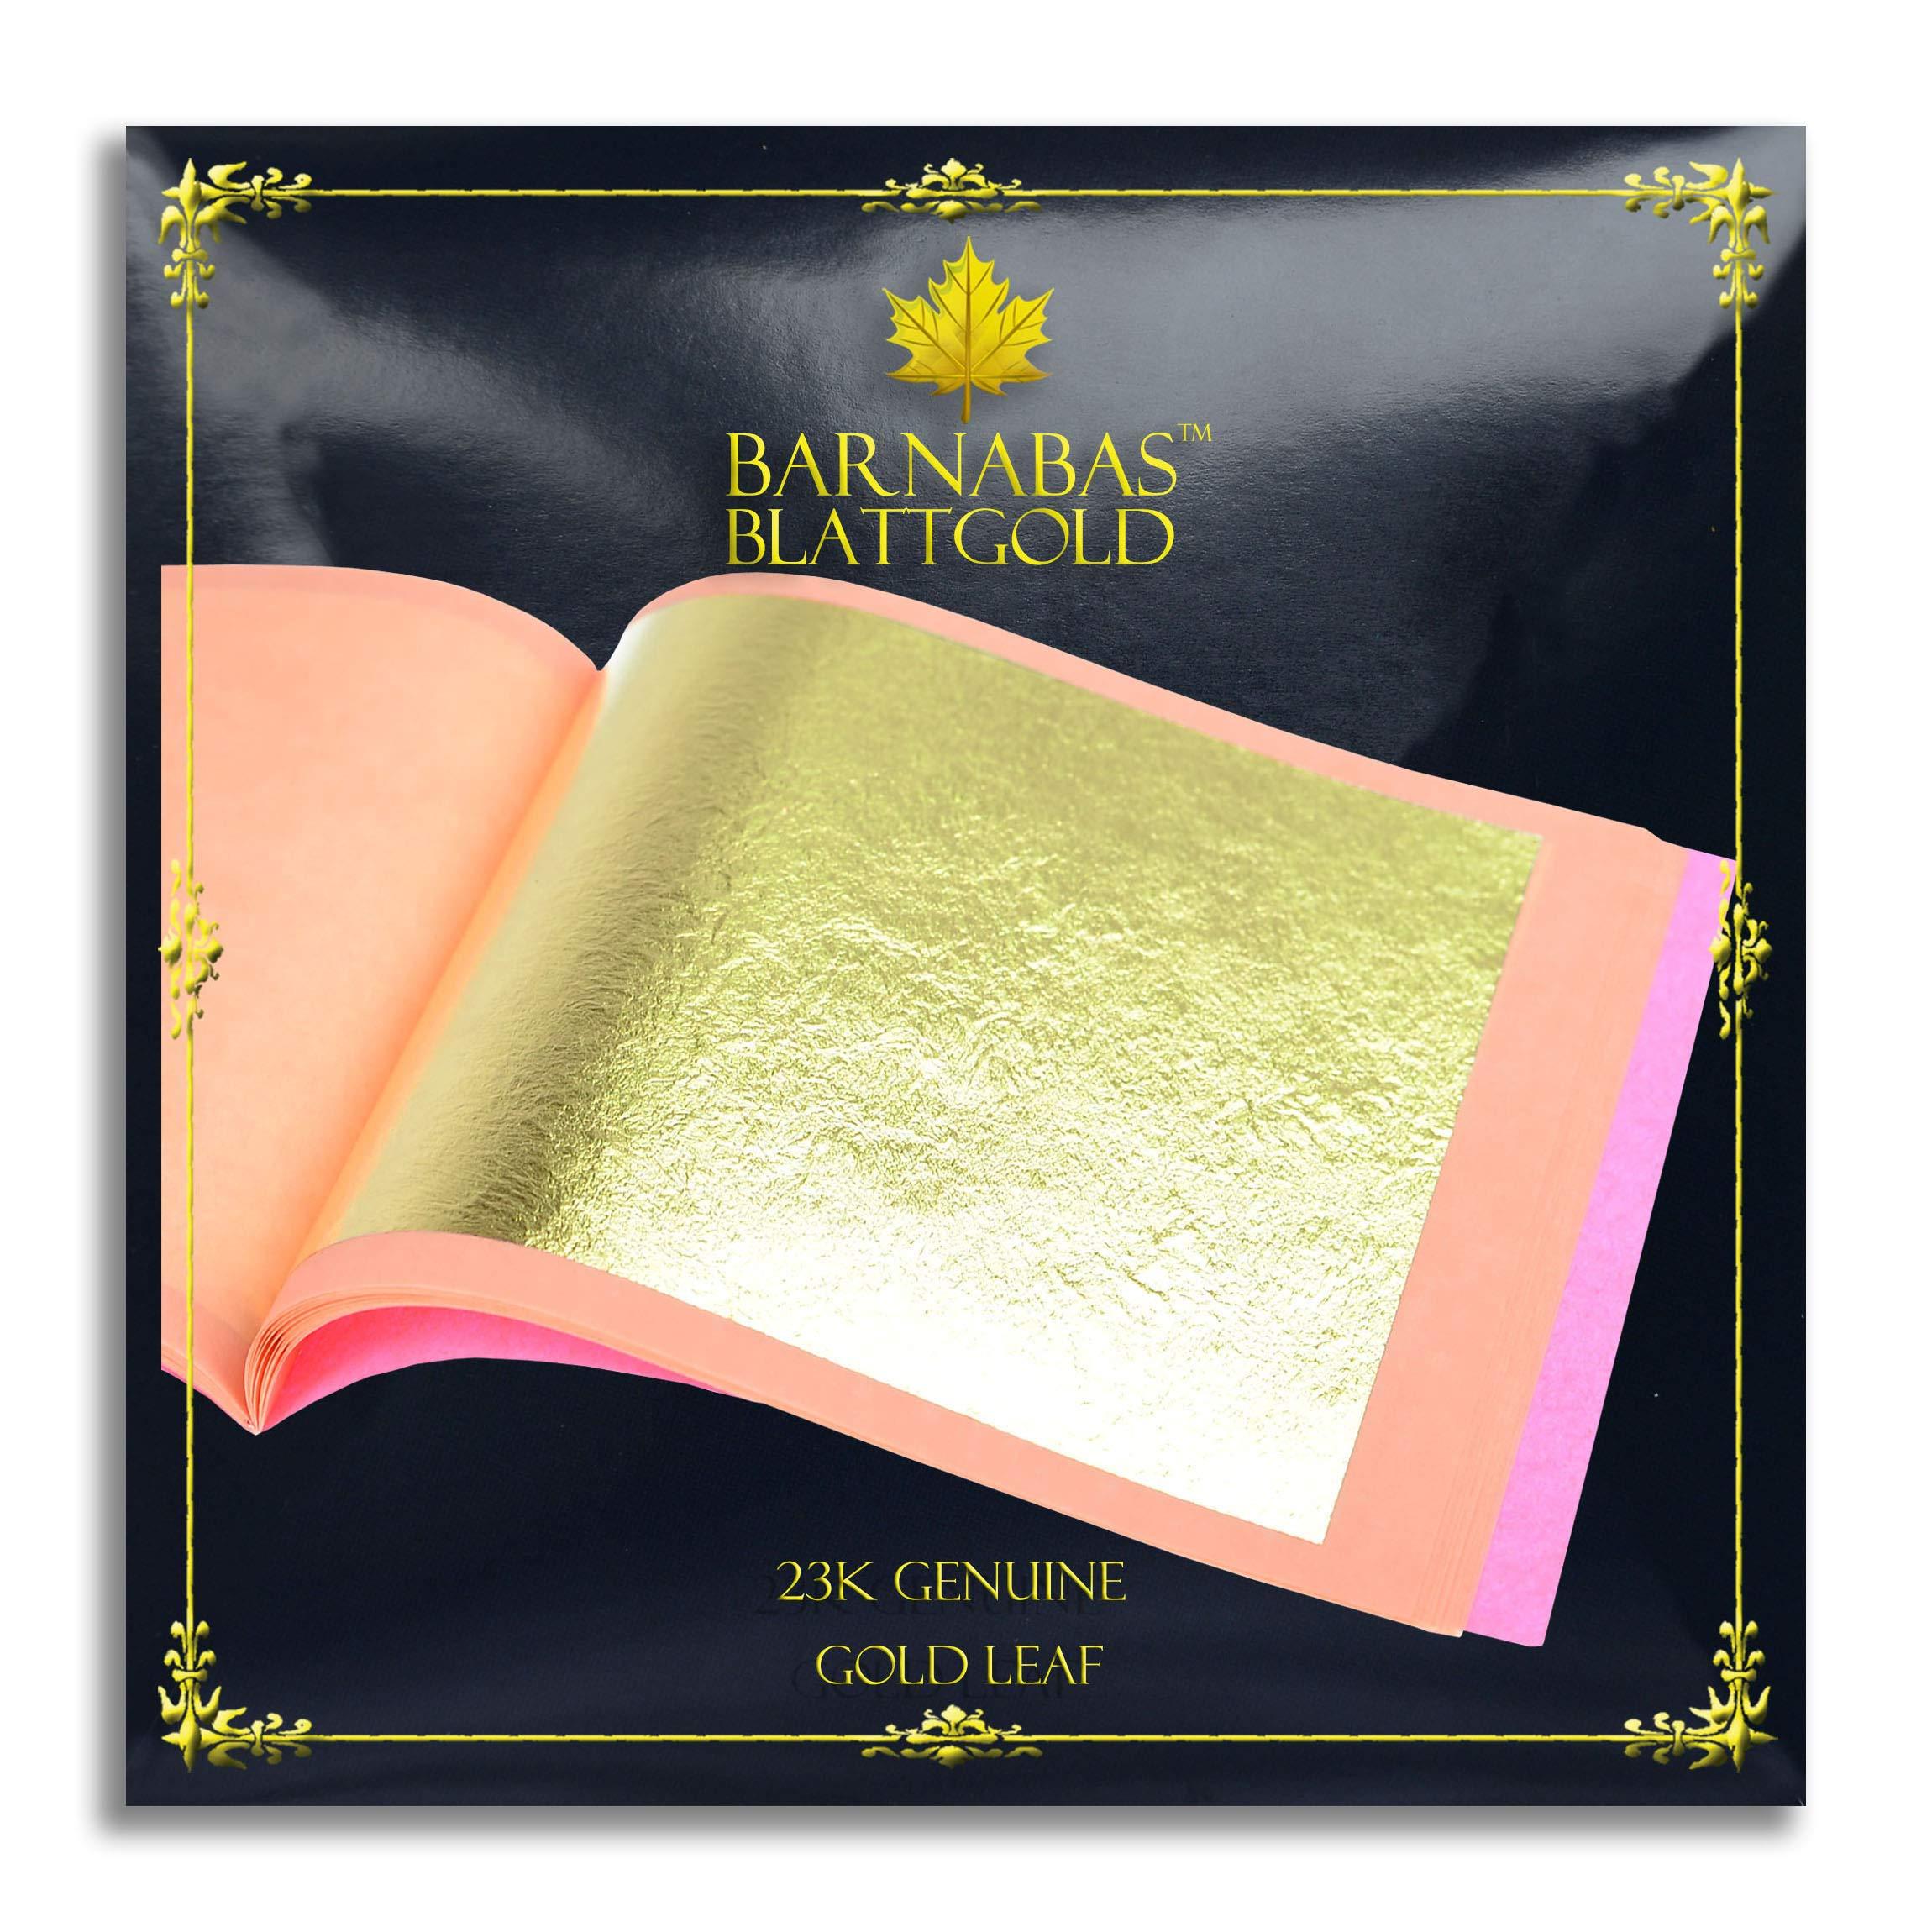 Genuine Gold Leaf Sheets 23k - by Barnabas Blattgold - 3.1 inches - 25 Sheets Booklet - Loose Leaf